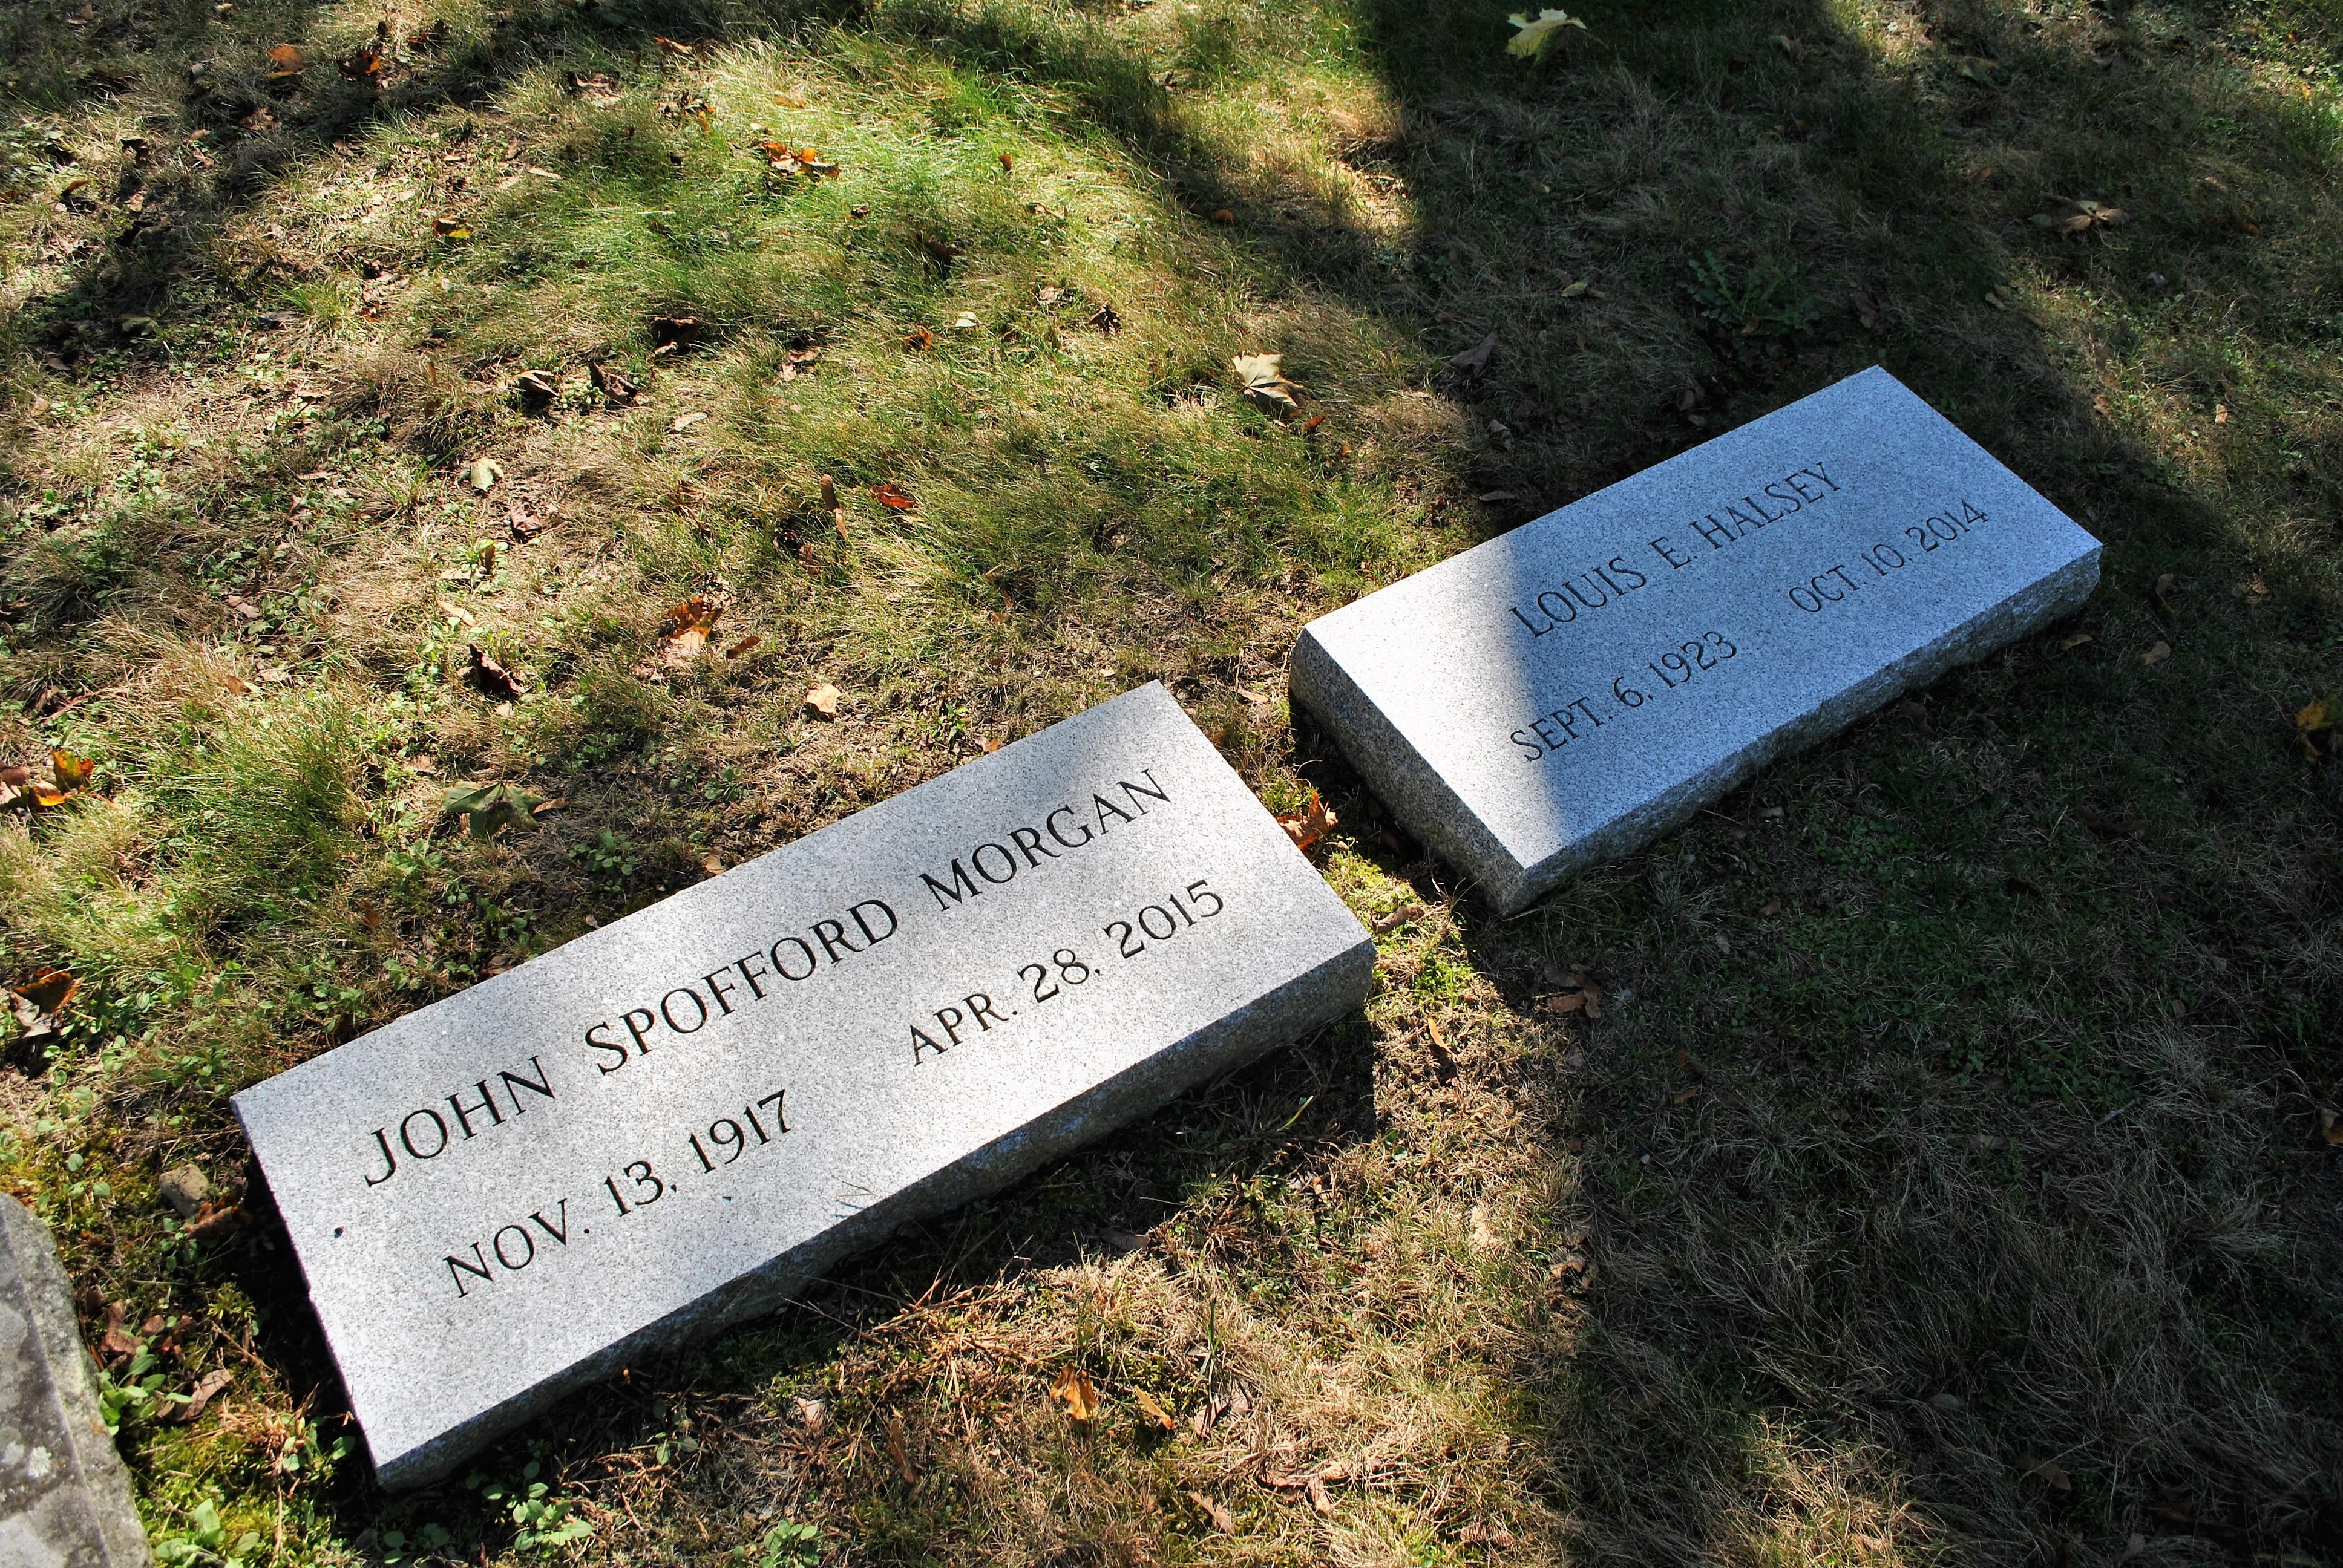 external image John_Spofford_Morgan_and_Louis_E._Halsey_tombstones.jpg